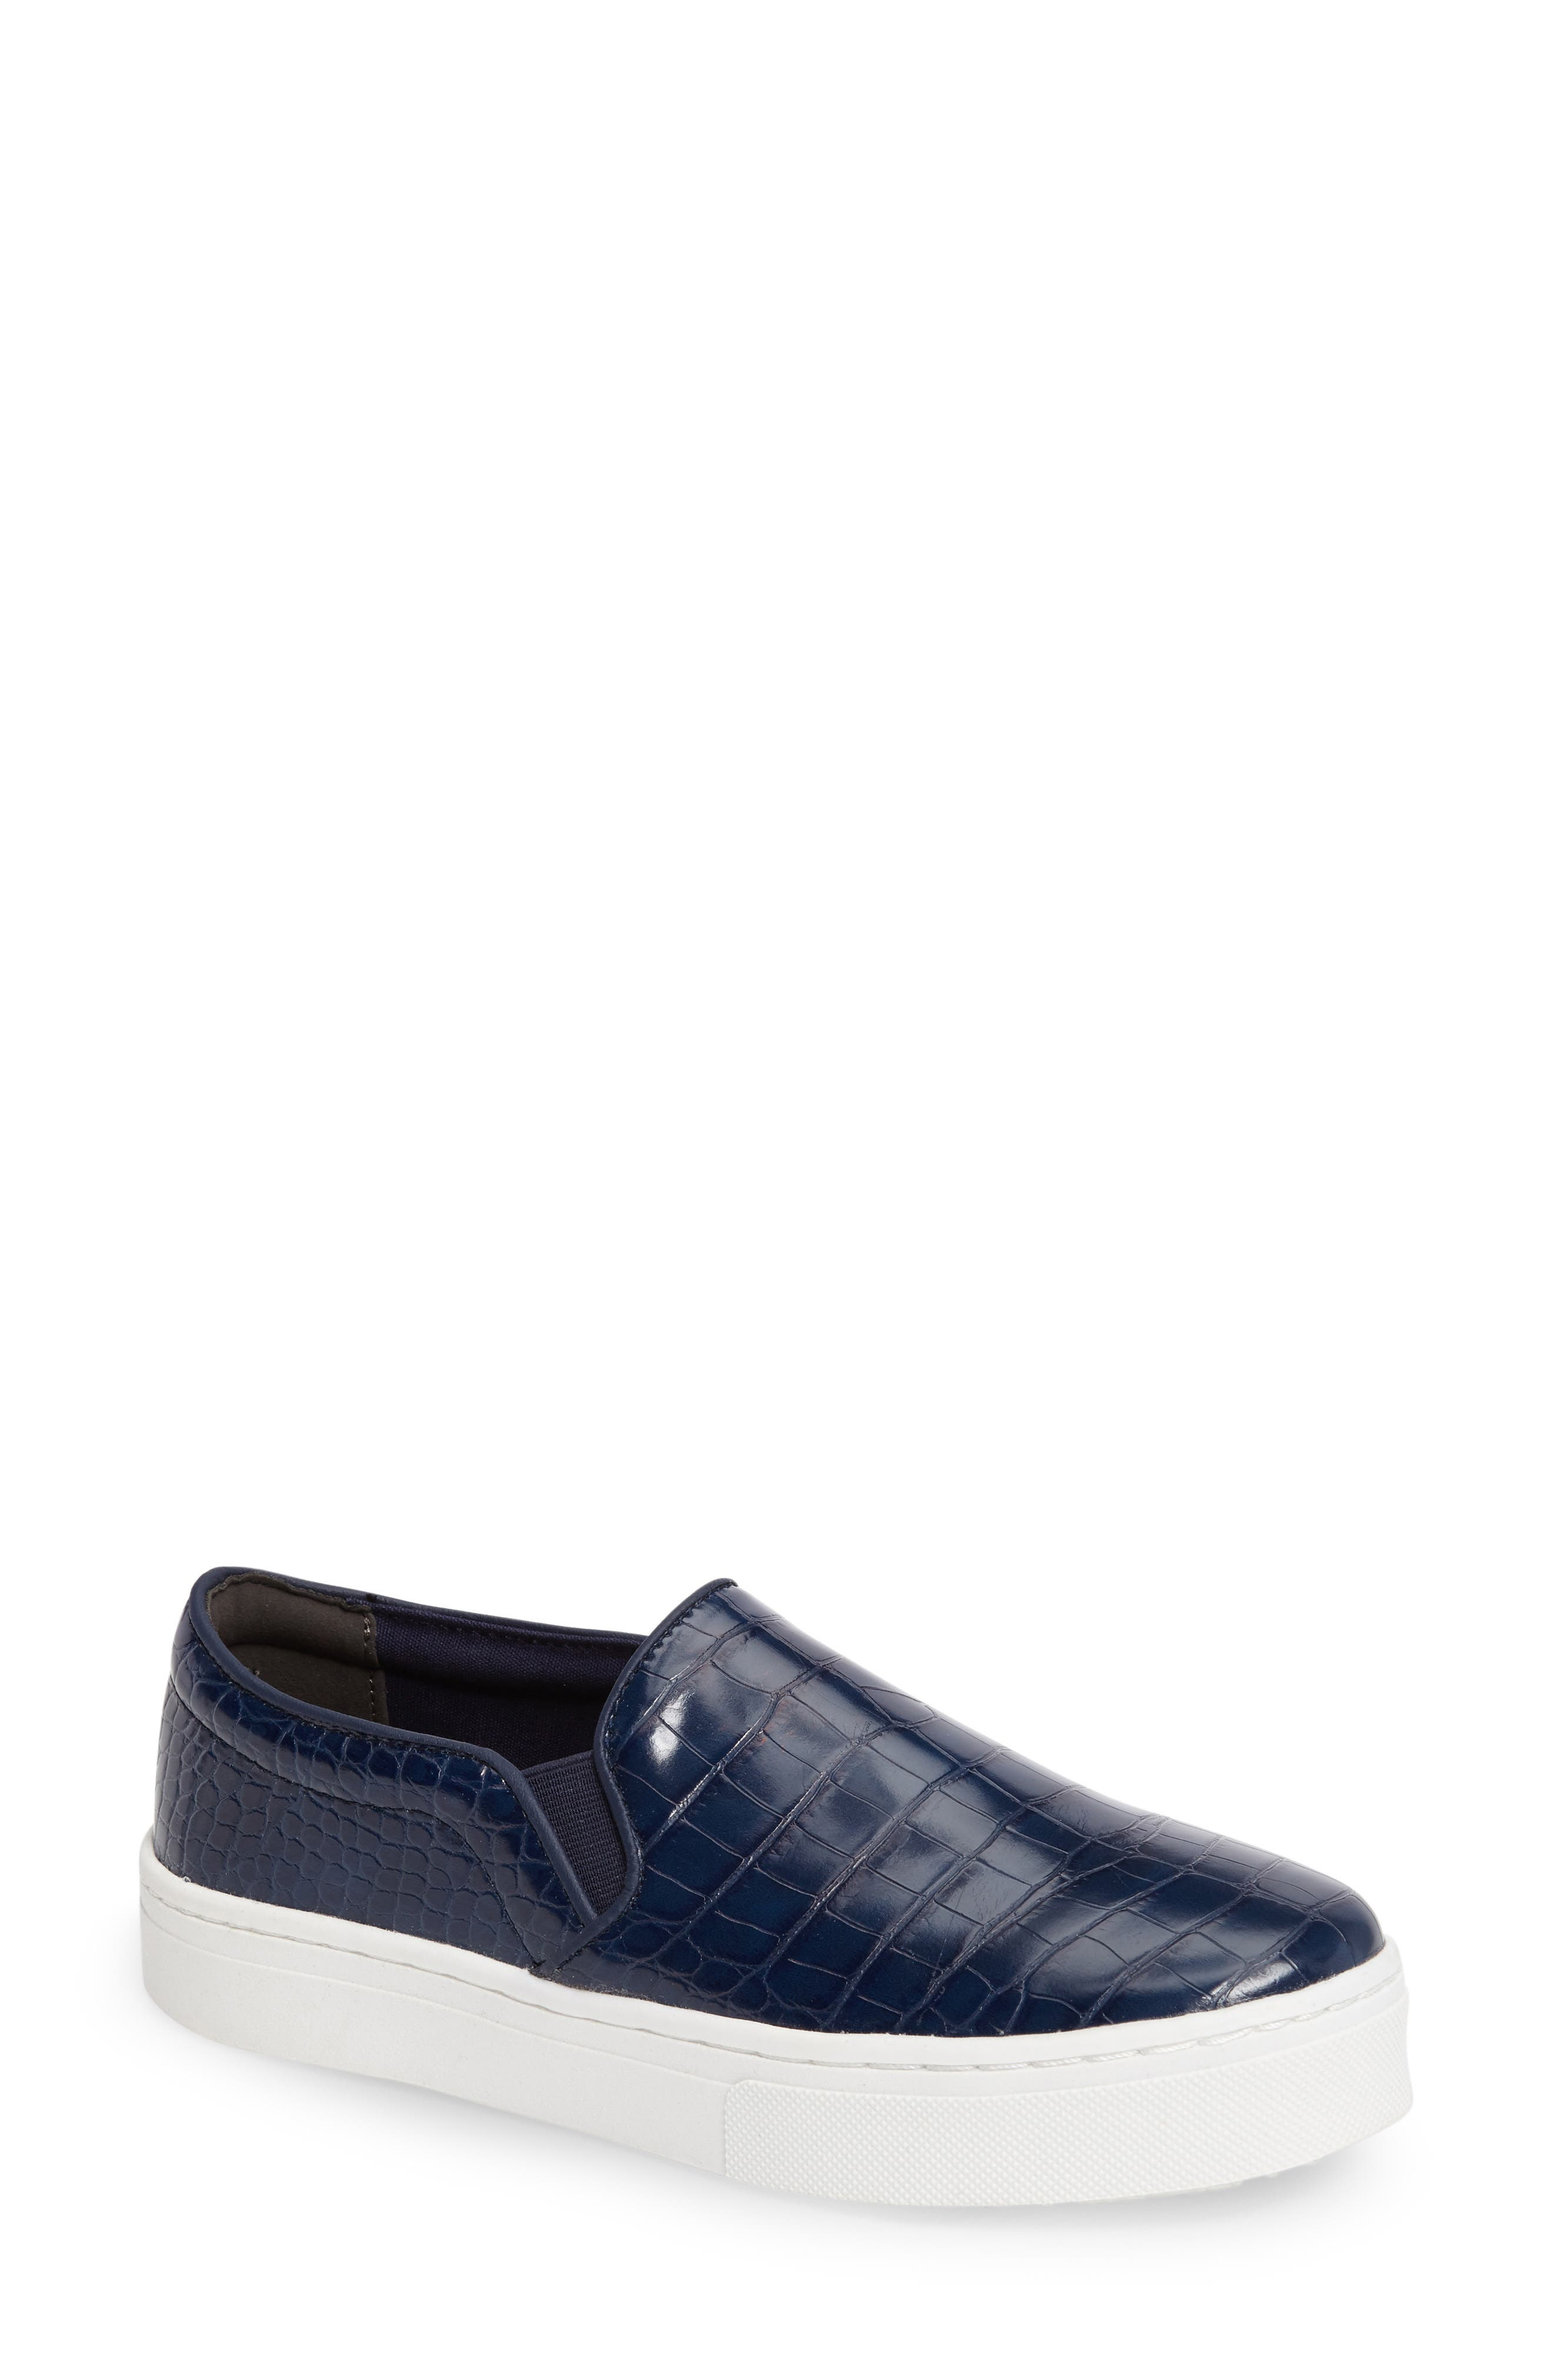 Alternate Image 1 Selected - Sam Edelman Lacey Slip-On Platform Sneaker (Women)